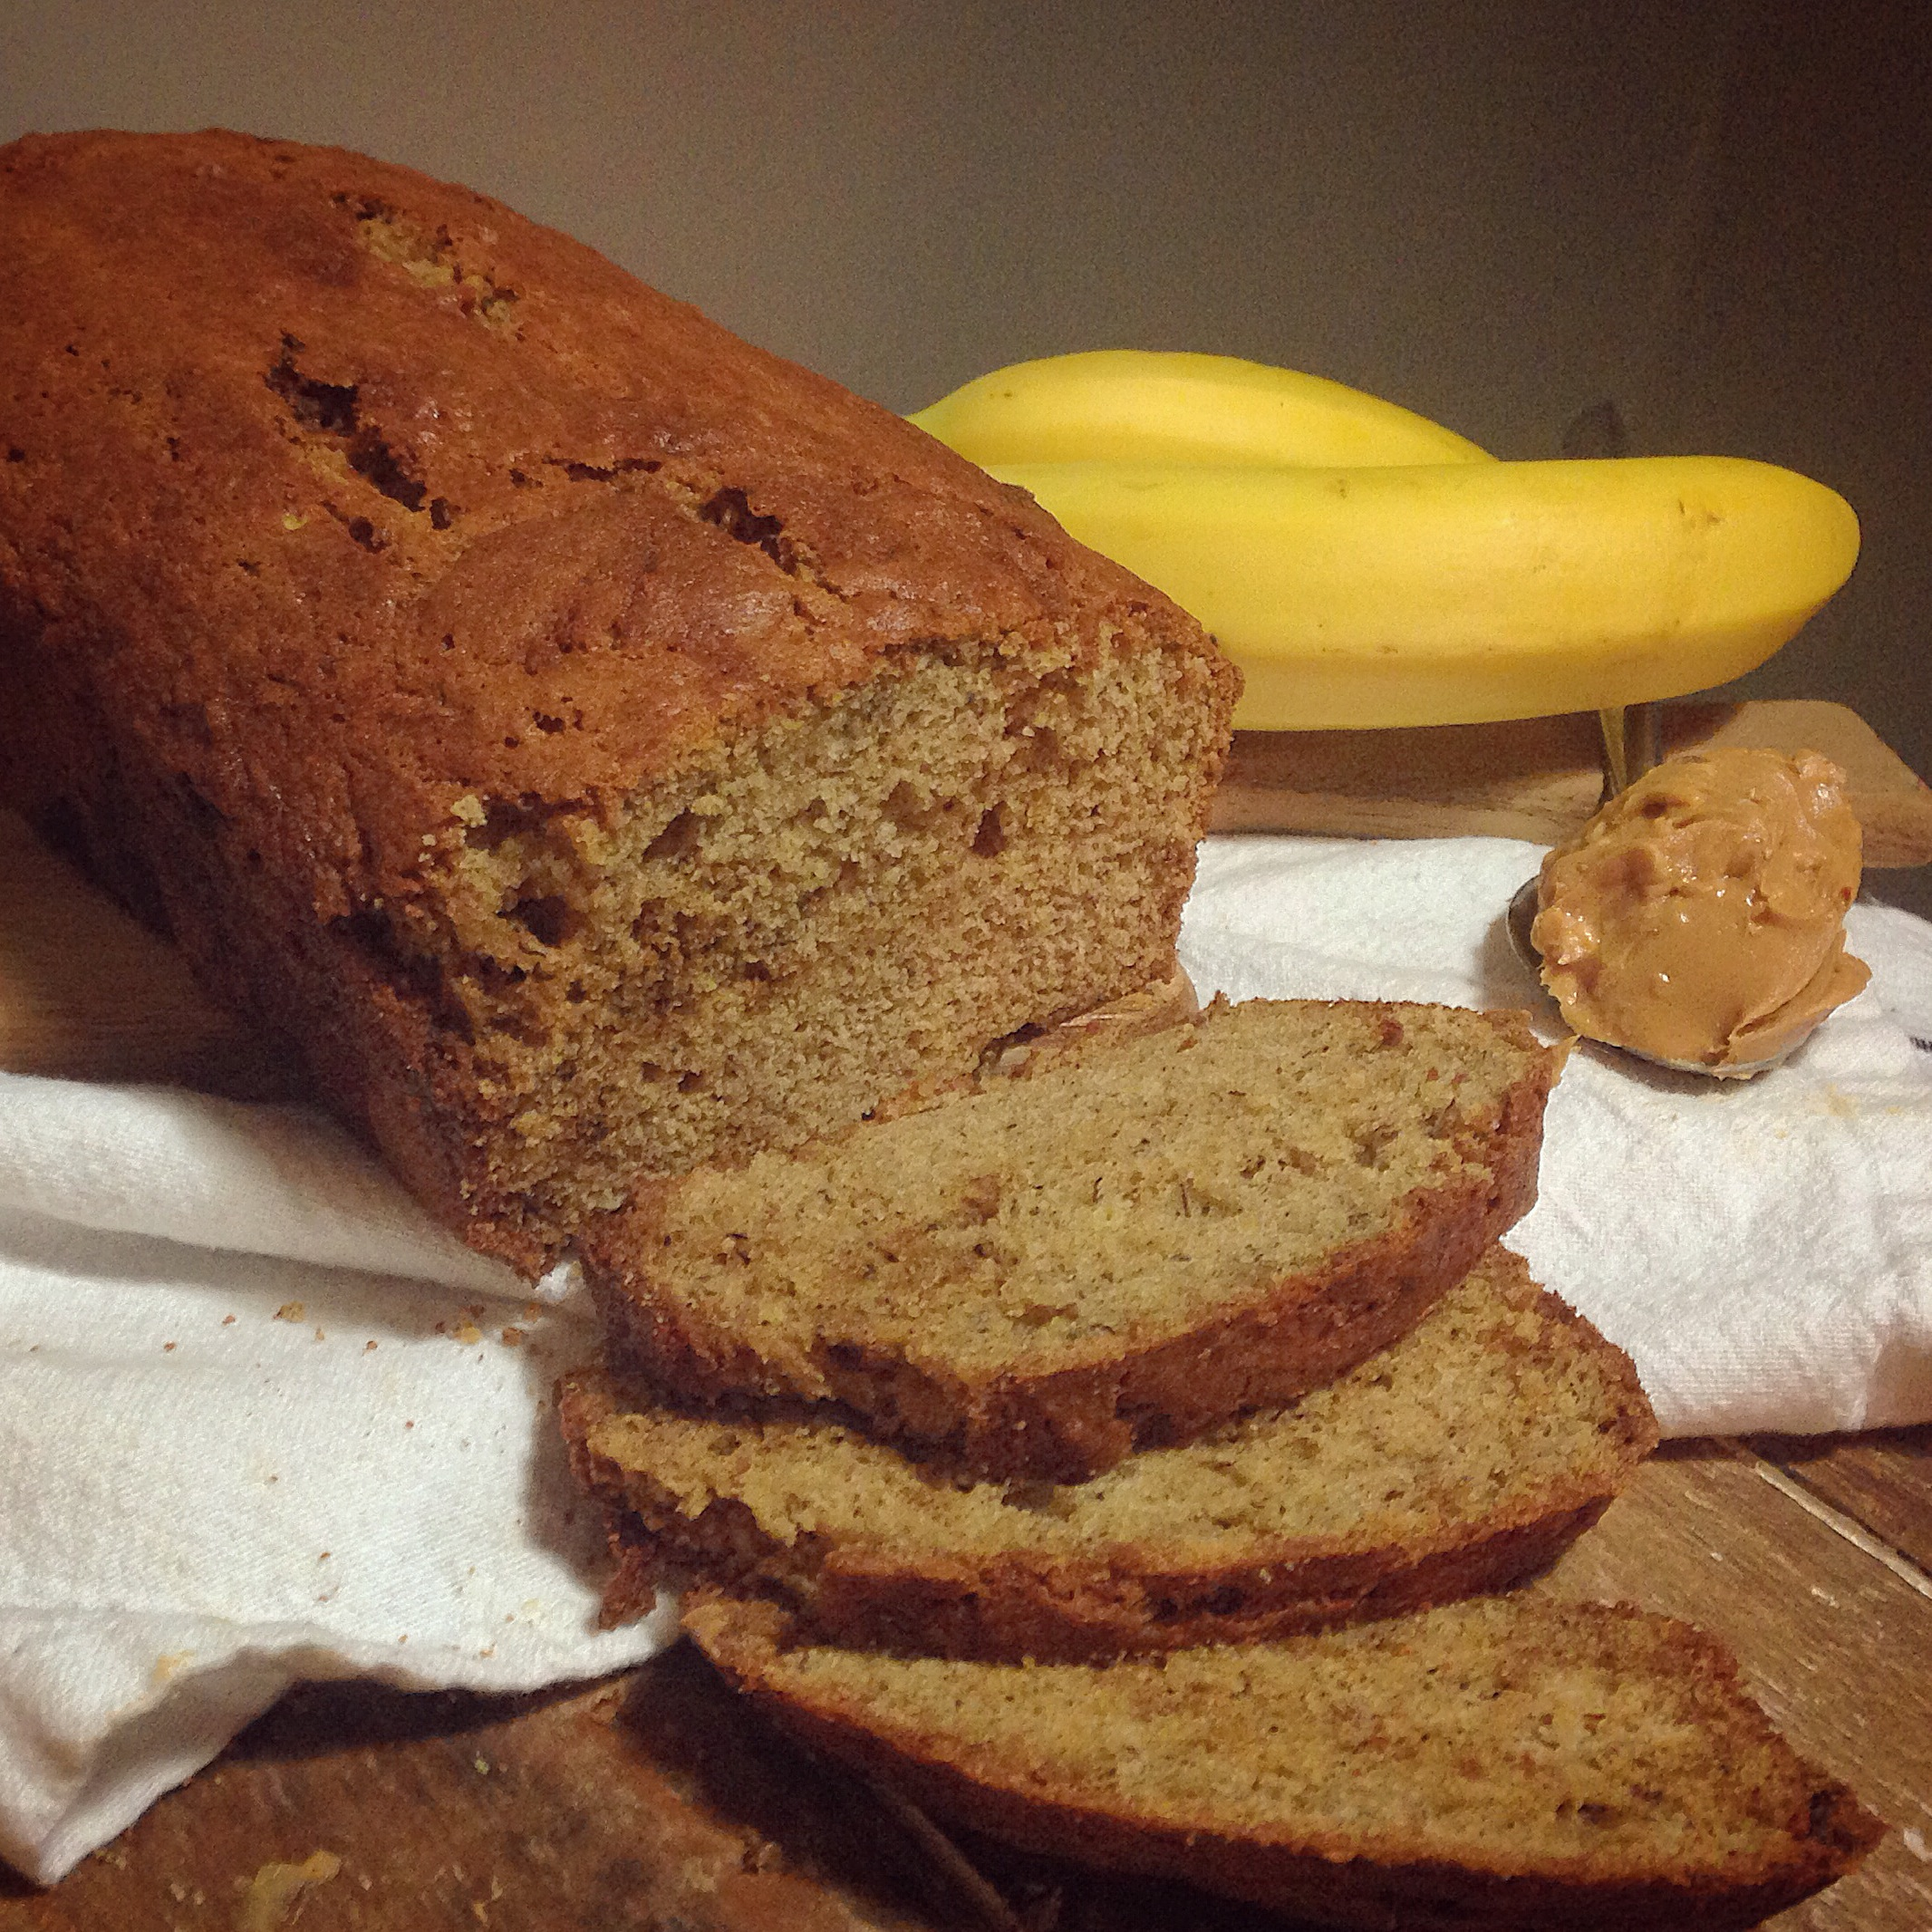 Hot and Fresh Banana Bread